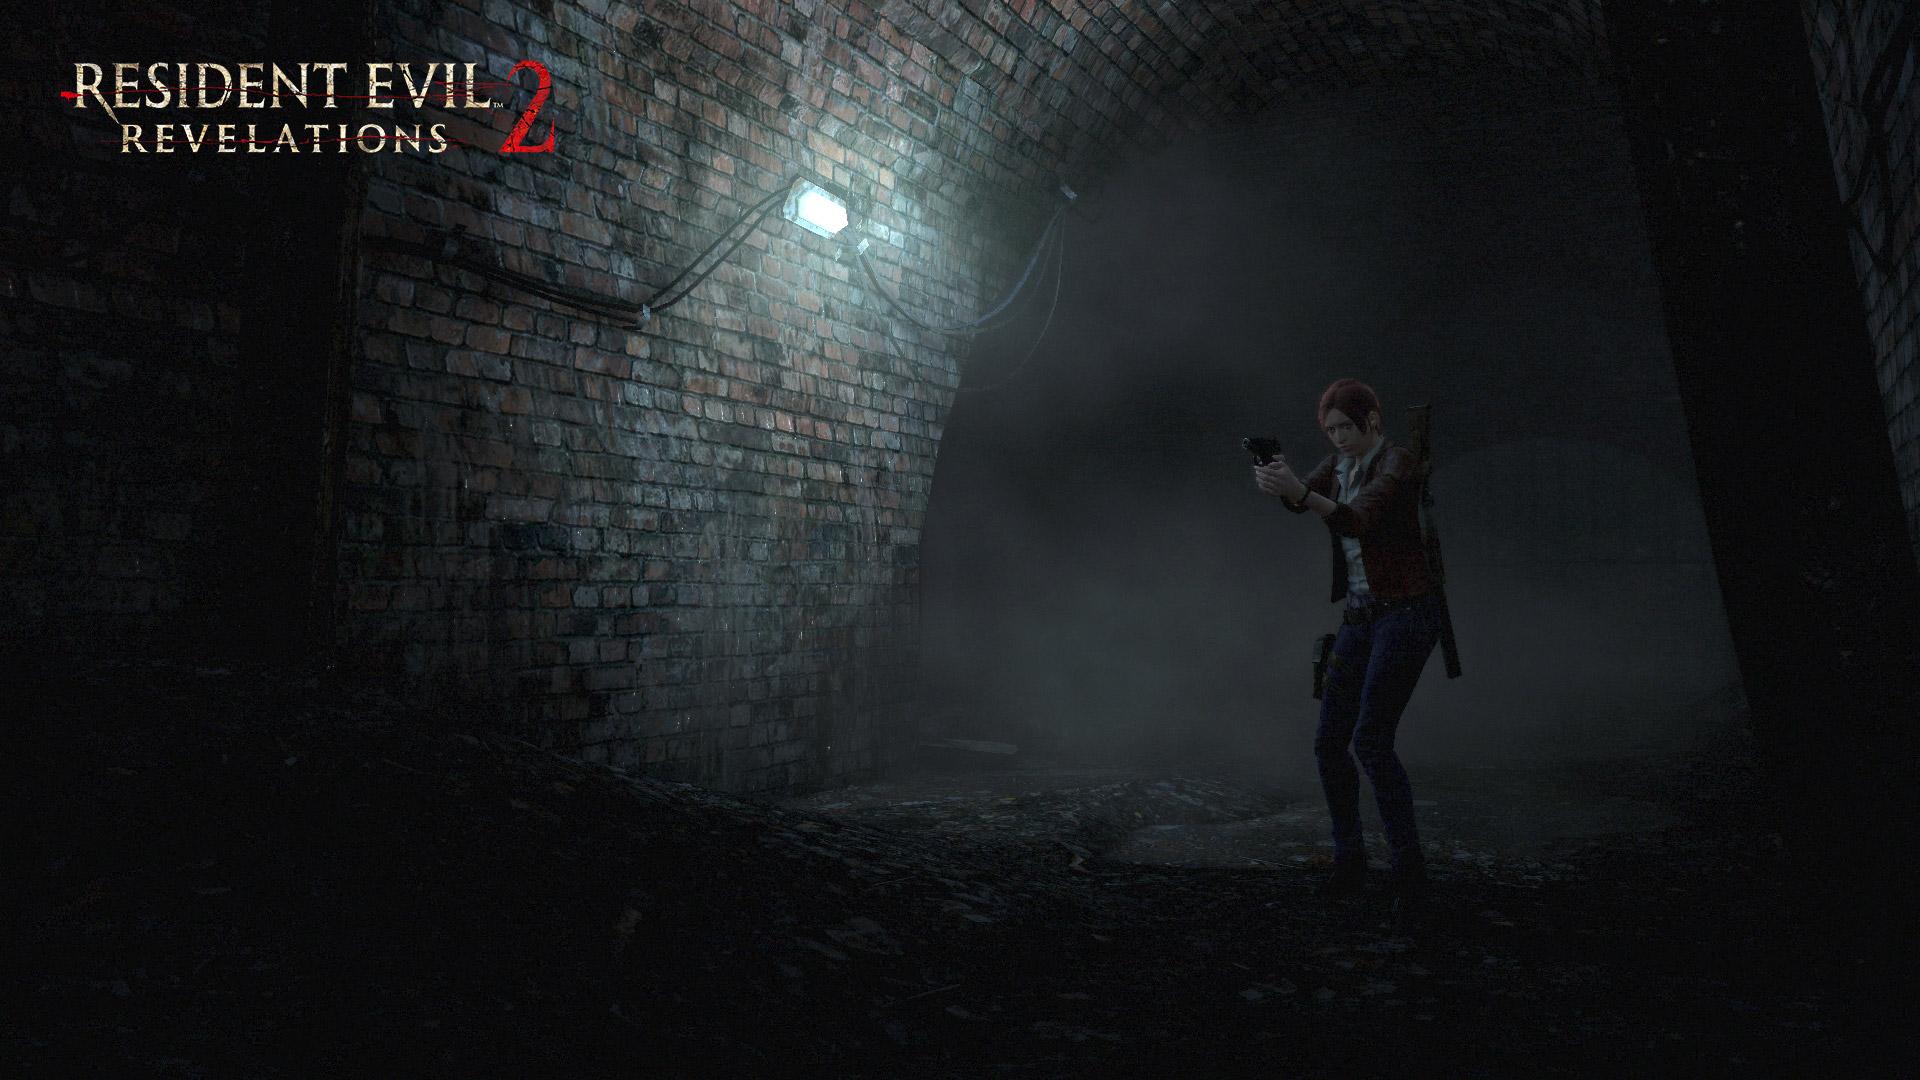 Free Download Resident Evil Revelations 2 Wallpaper In 1920x1080